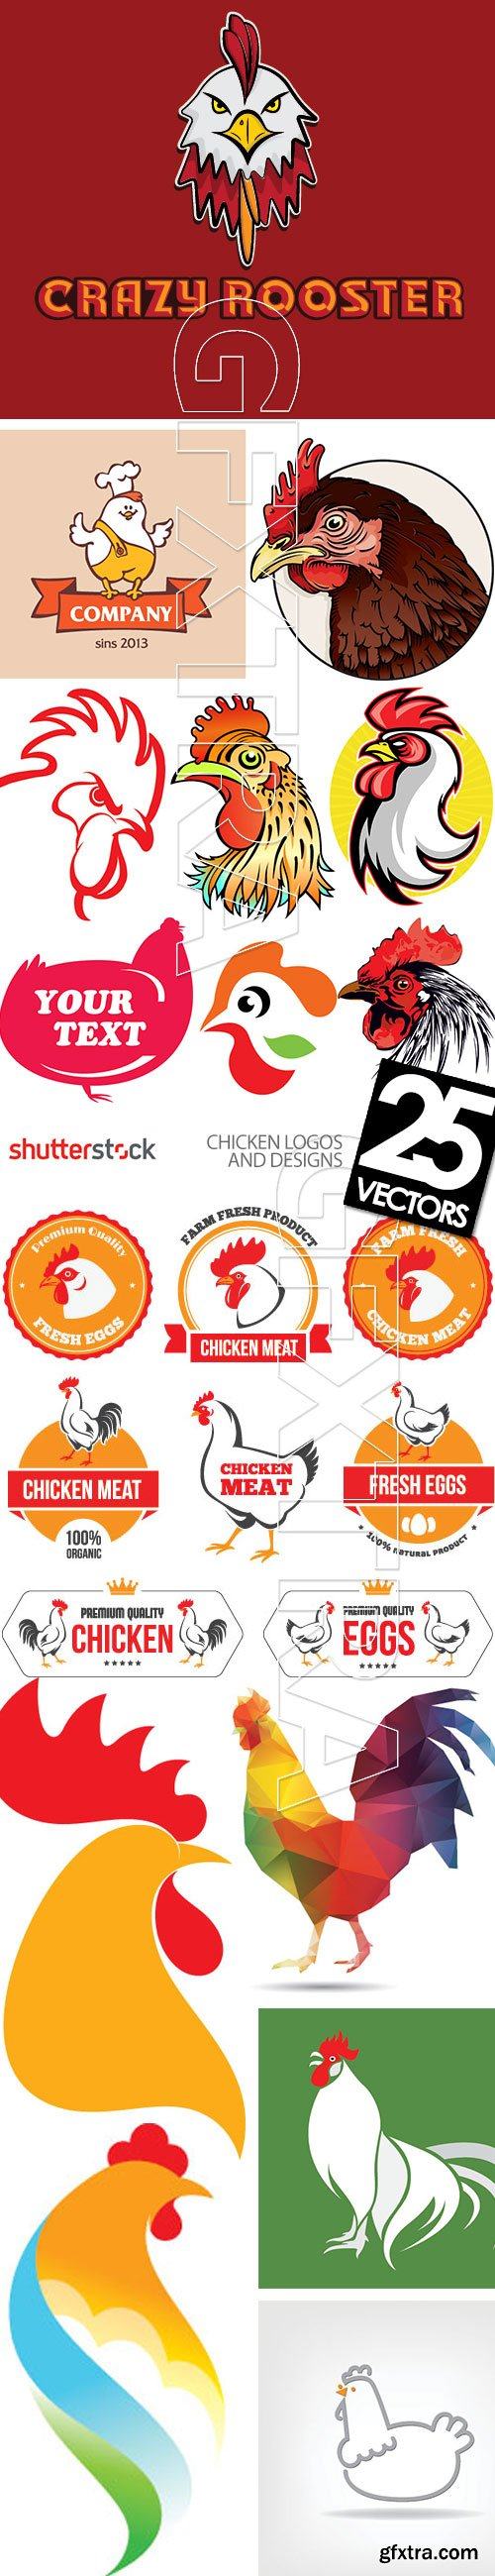 Chicken Logos & Designs 25xEPS